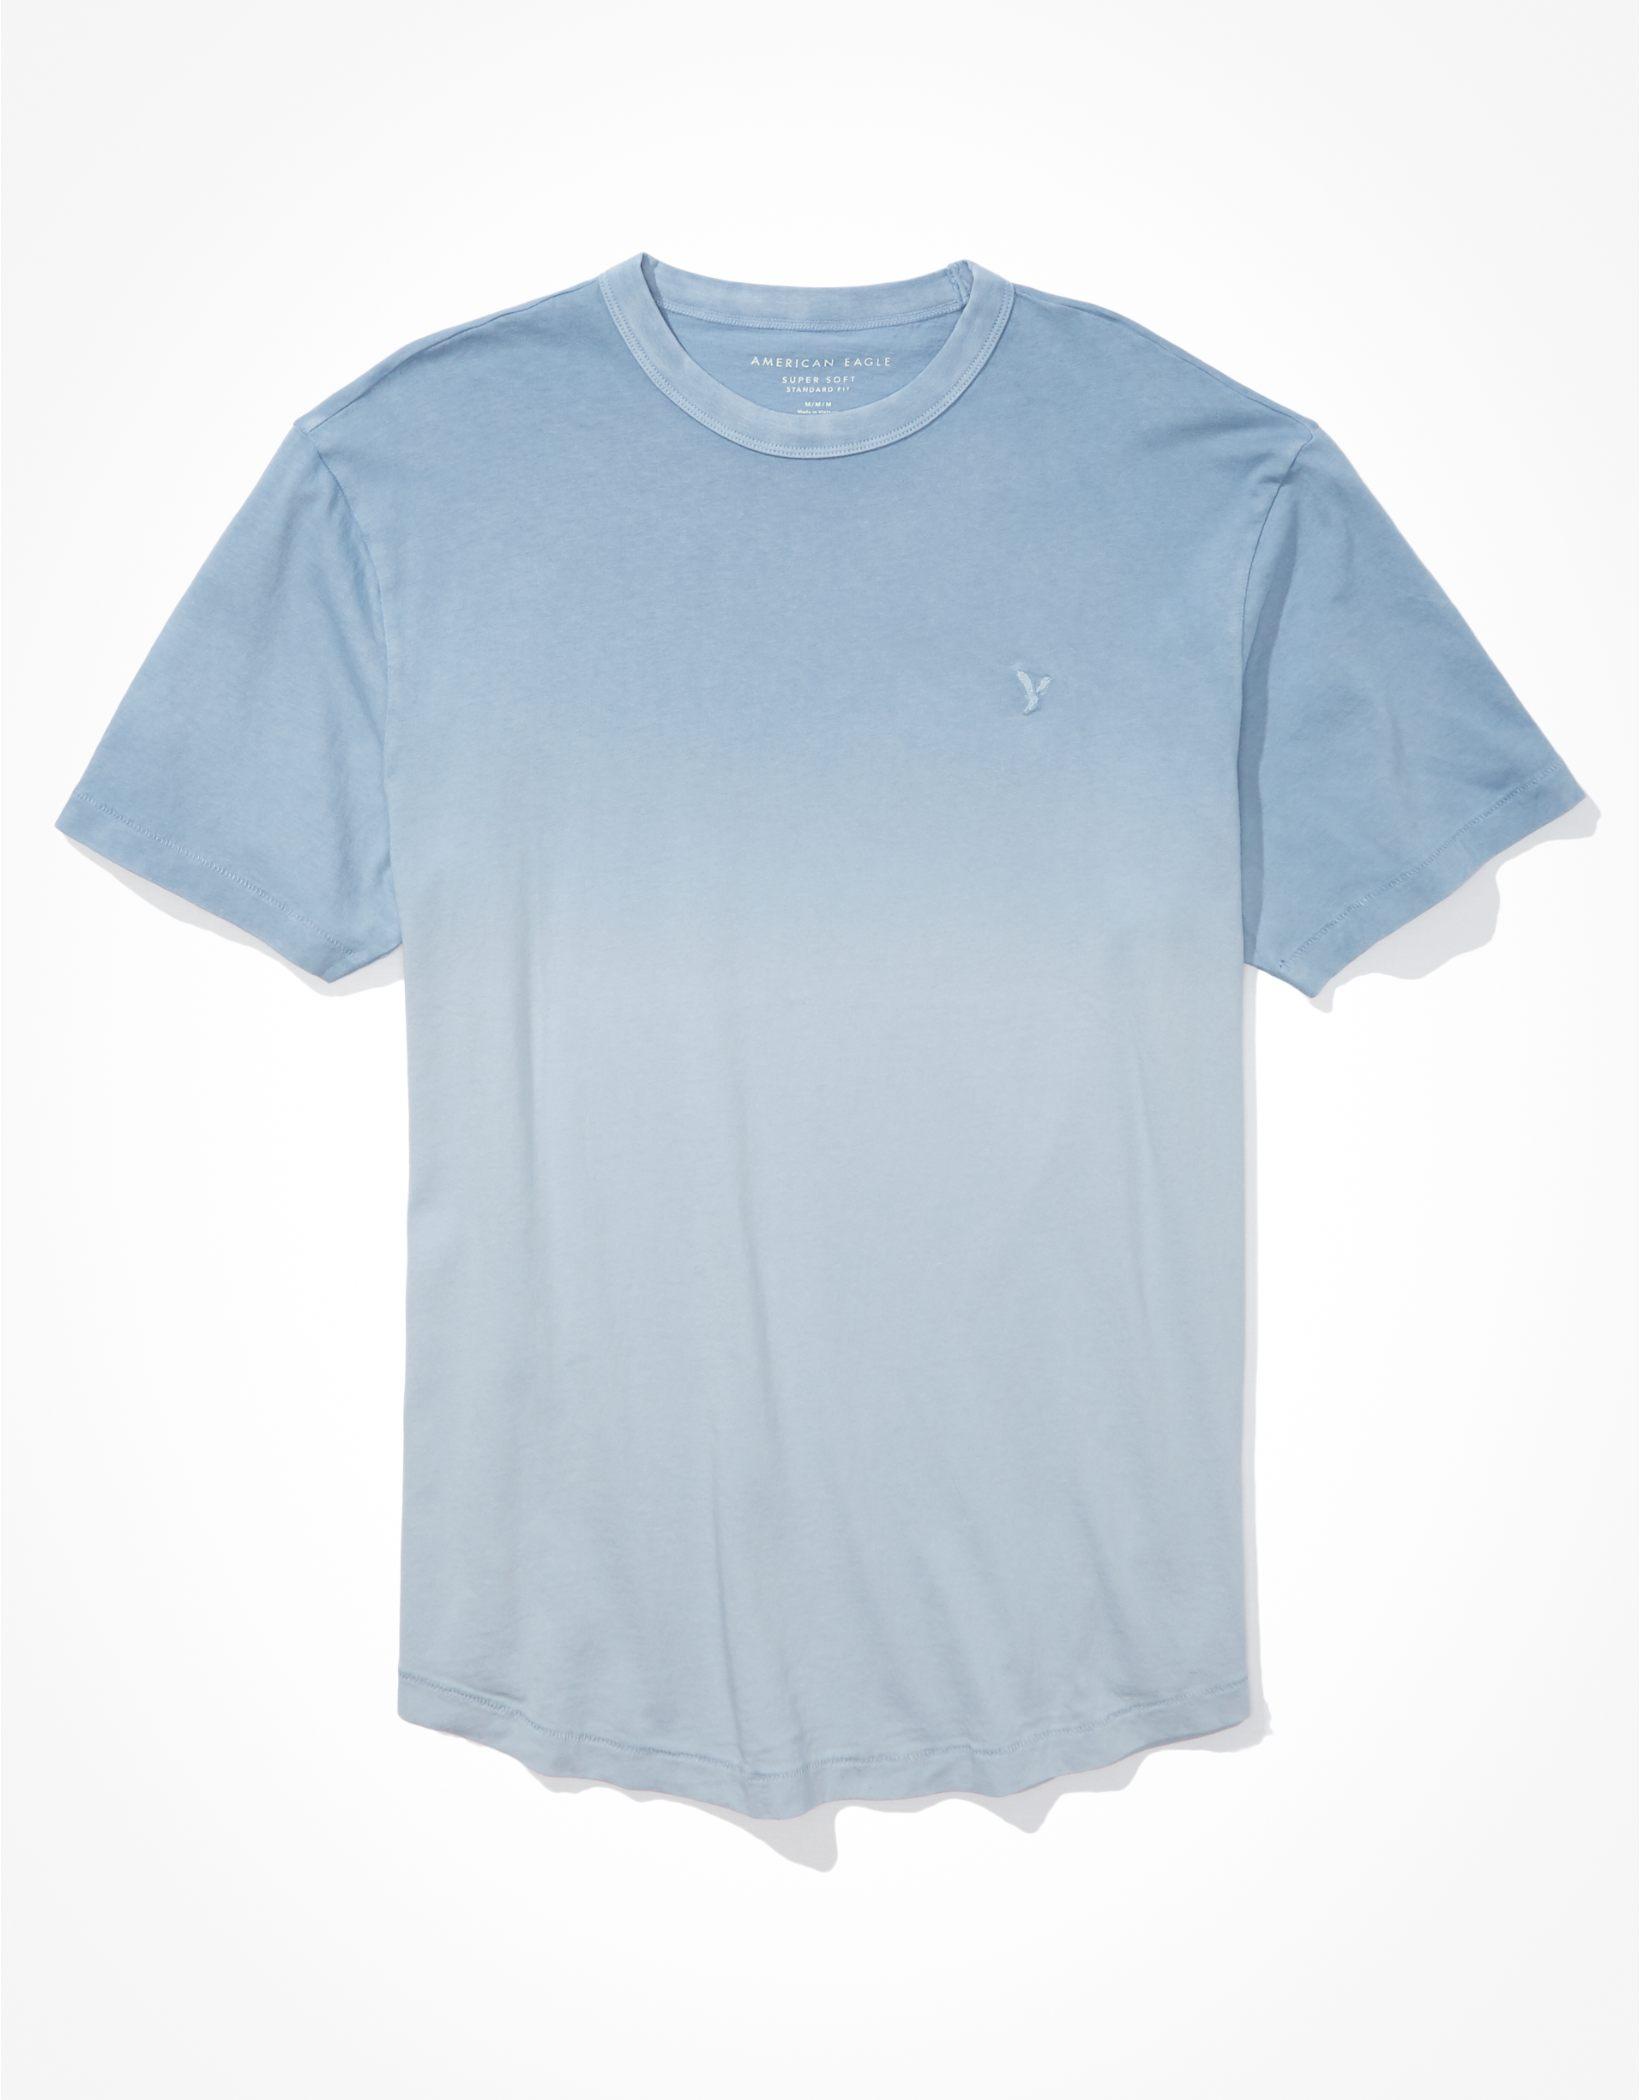 AE Super Soft Curved Hem Icon T-Shirt